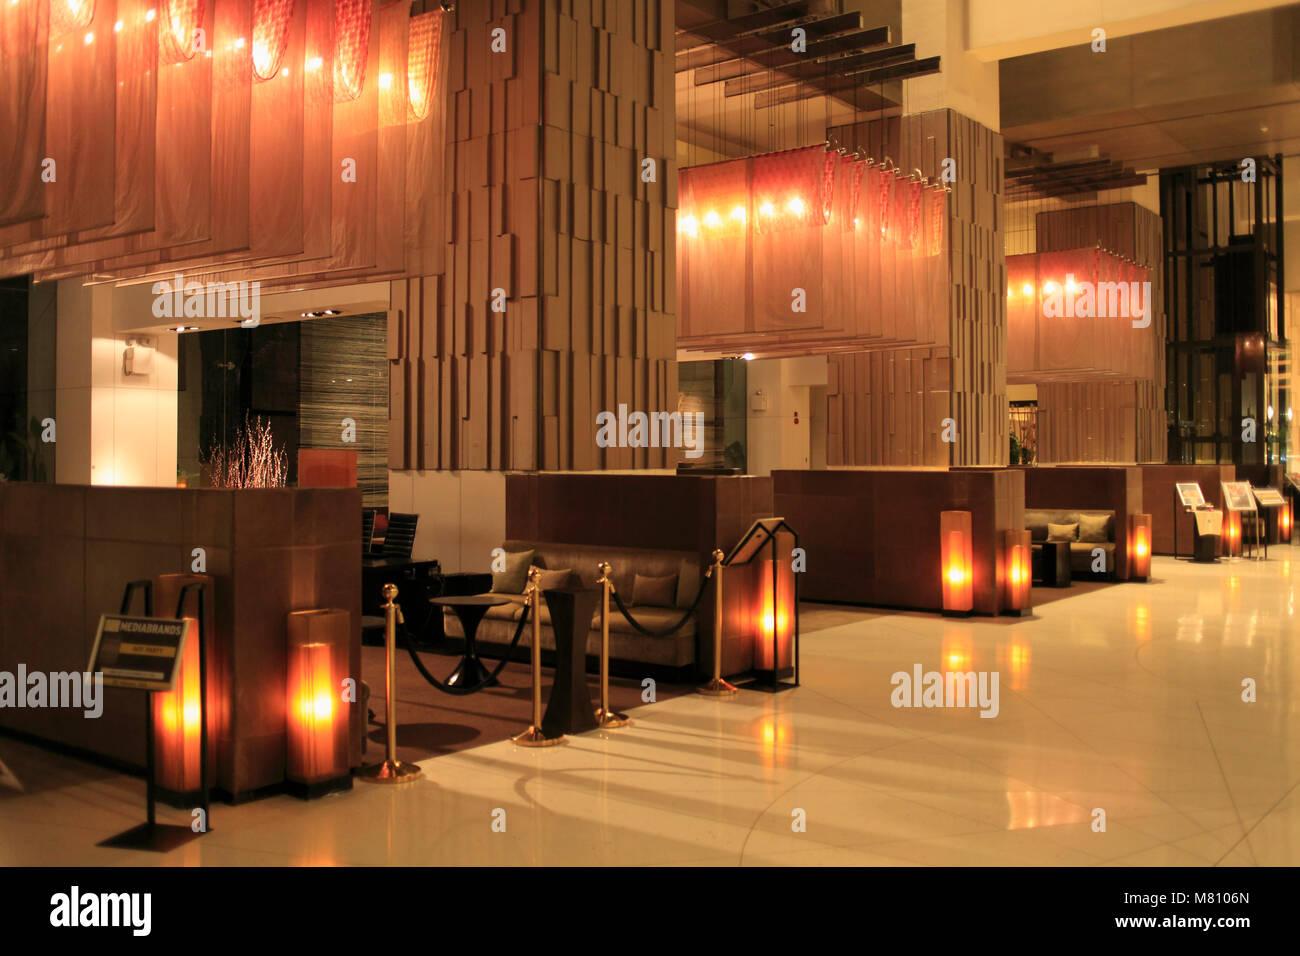 Hilton Hotel Lobby Stock Photos & Hilton Hotel Lobby Stock Images ...